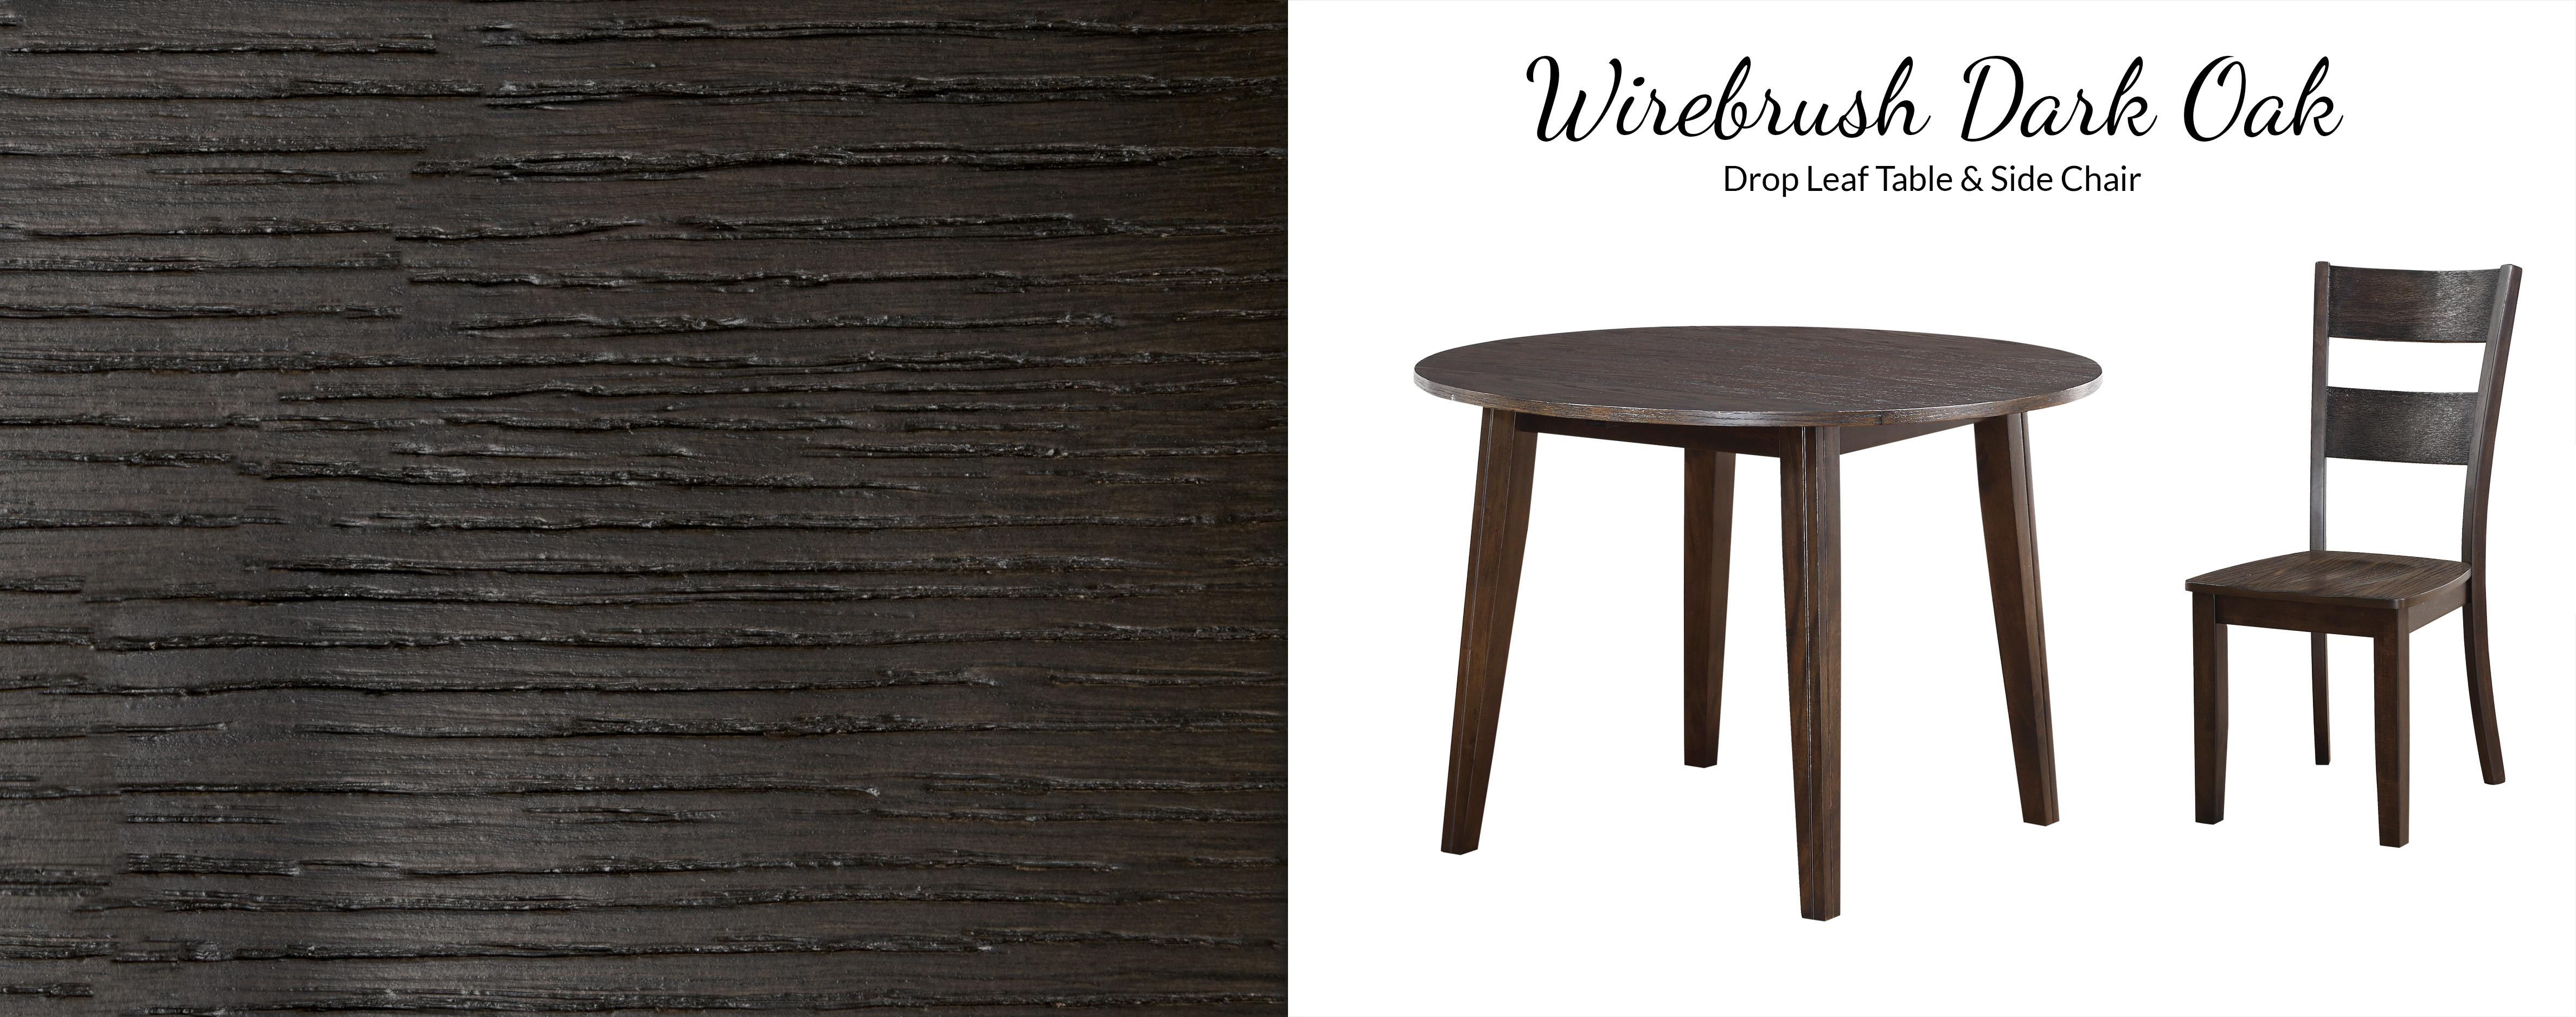 8204 Wirebrush Dark Oak Drop Leaf Table Awfco Catalog Site